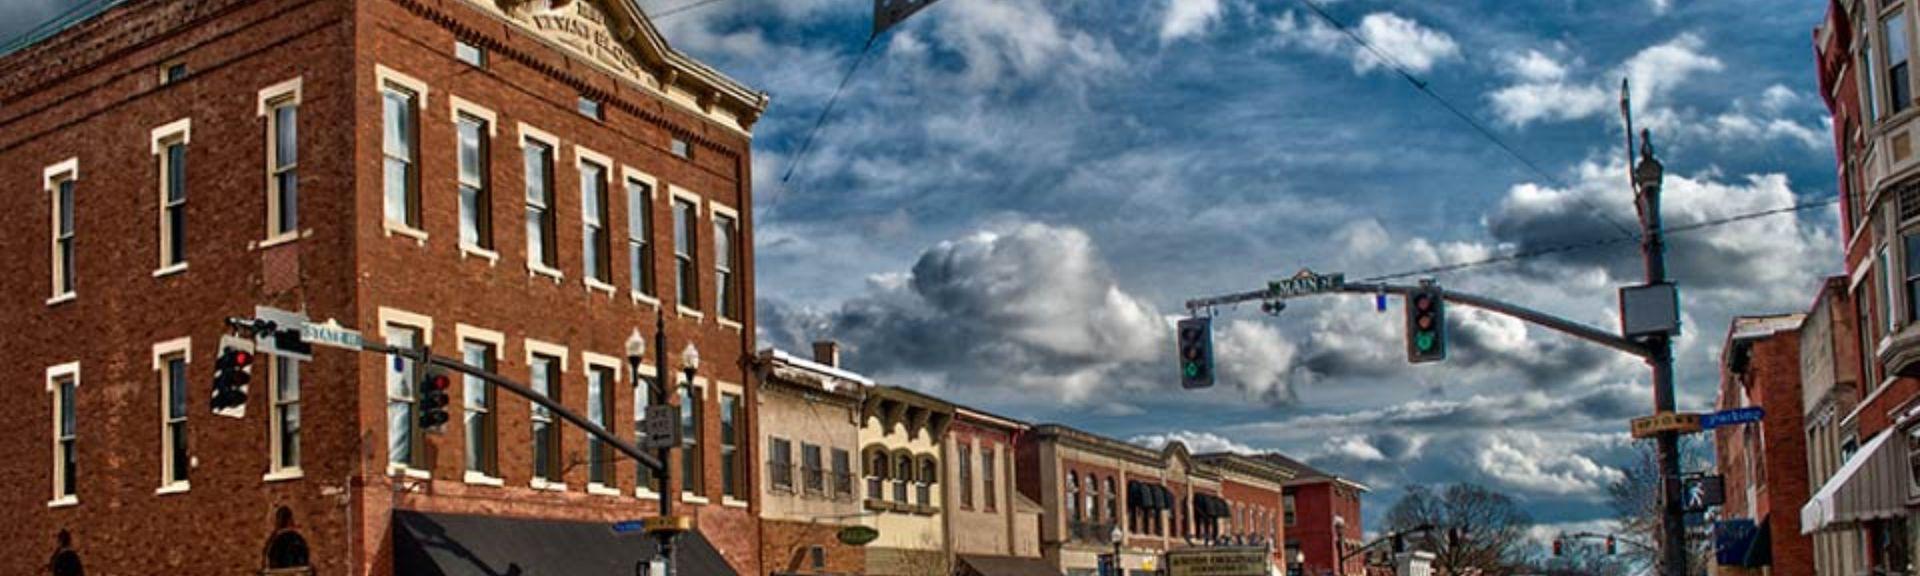 Easton Town Center, Columbus, Ohio, United States of America